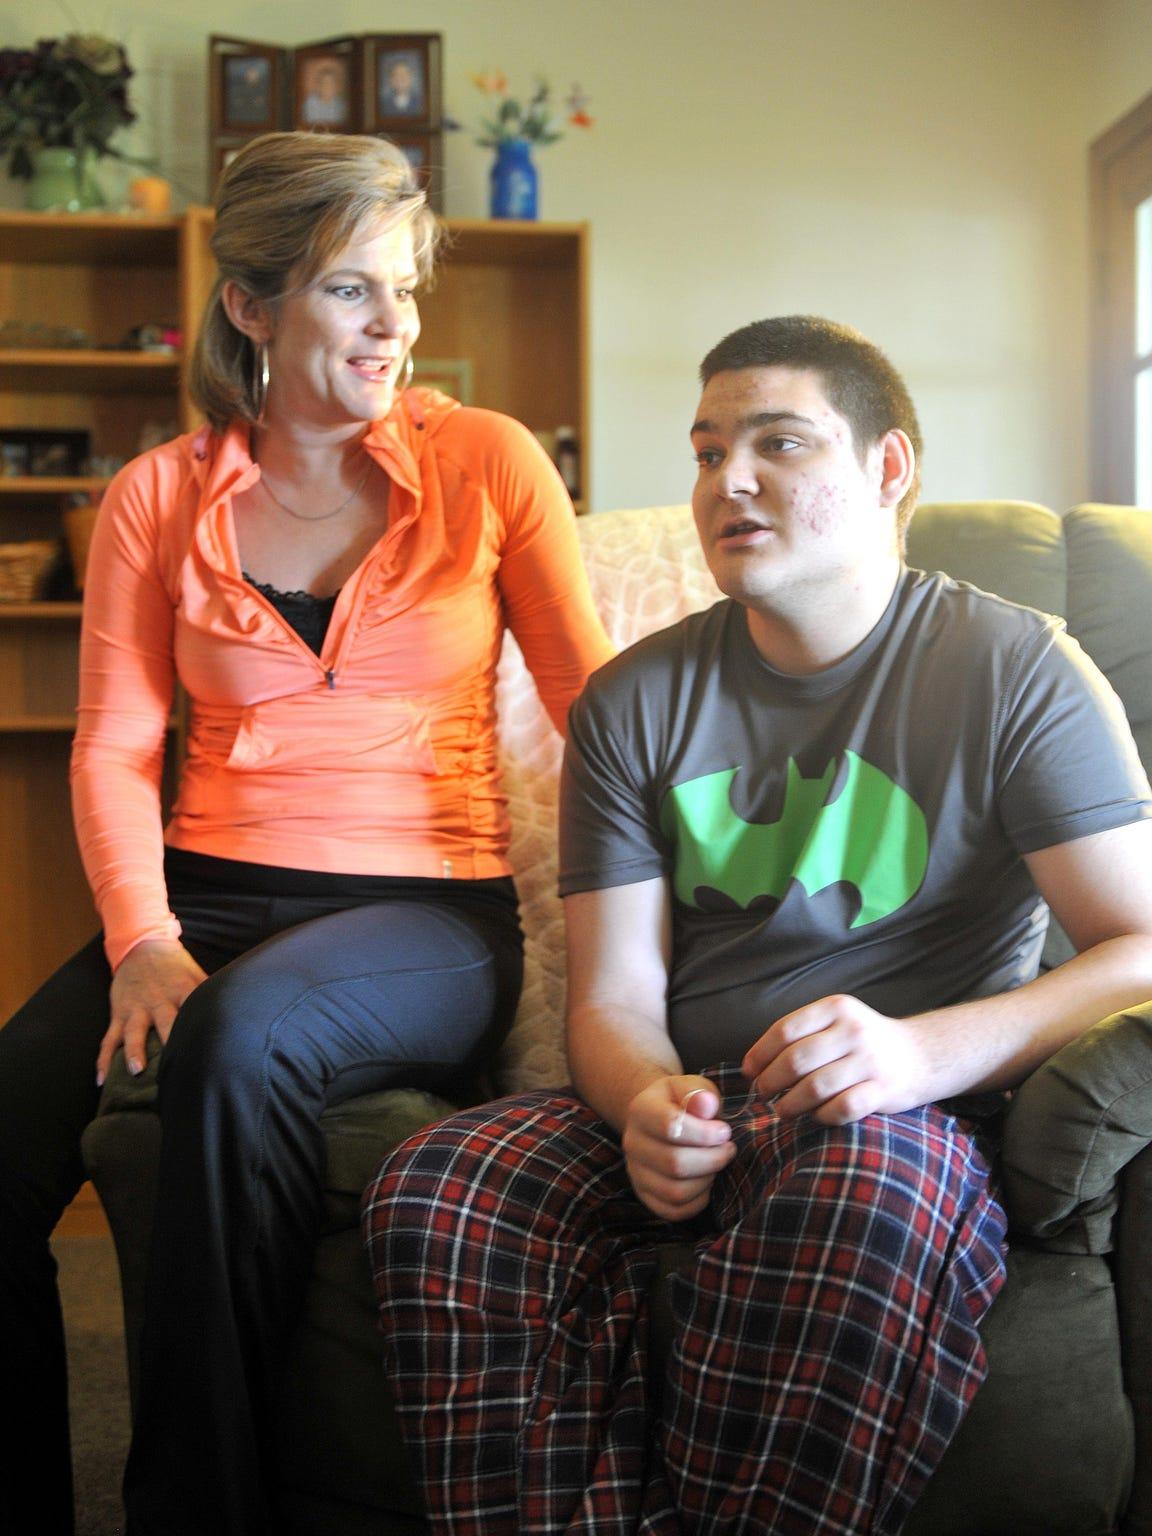 Roberta Doklovic sits next to her son, Zach Kauffman,